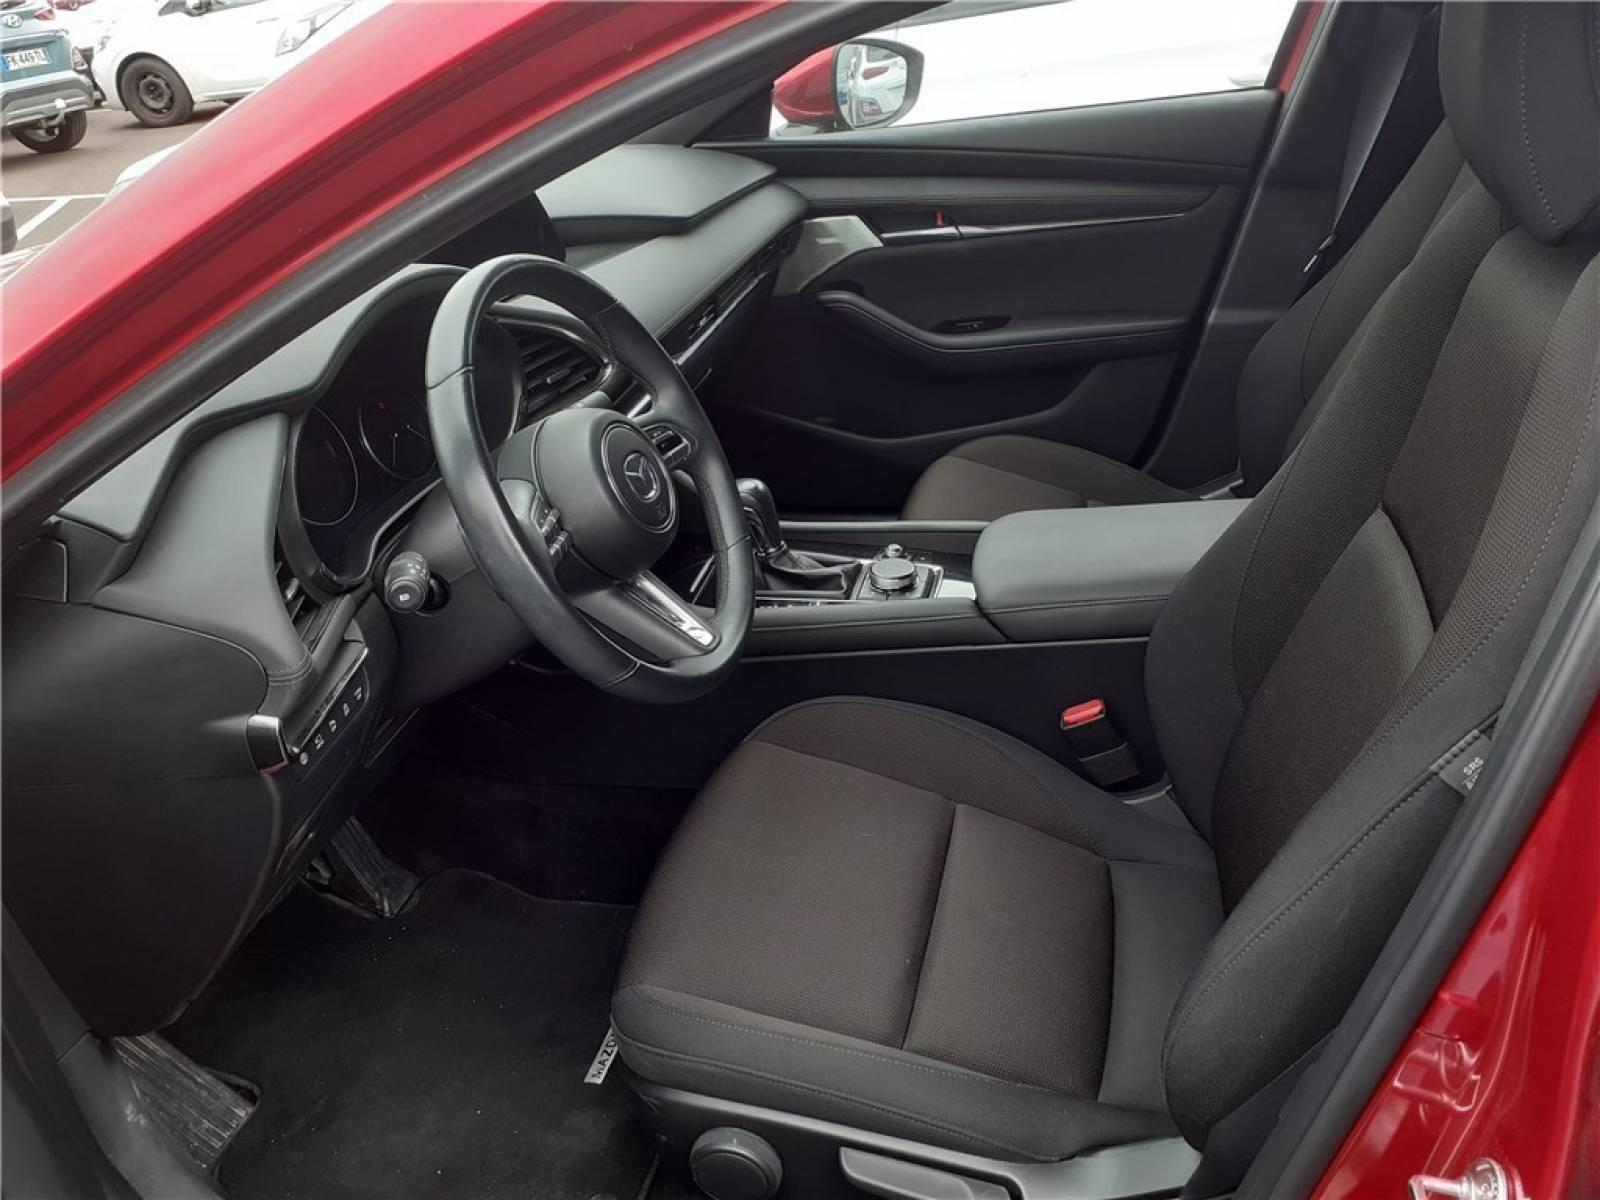 MAZDA Mazda3 5 portes 2.0L SKYACTIV-G M Hybrid 122 ch BVA6 - véhicule d'occasion - Groupe Guillet - Chalon Automobiles - 71100 - Chalon-sur-Saône - 36